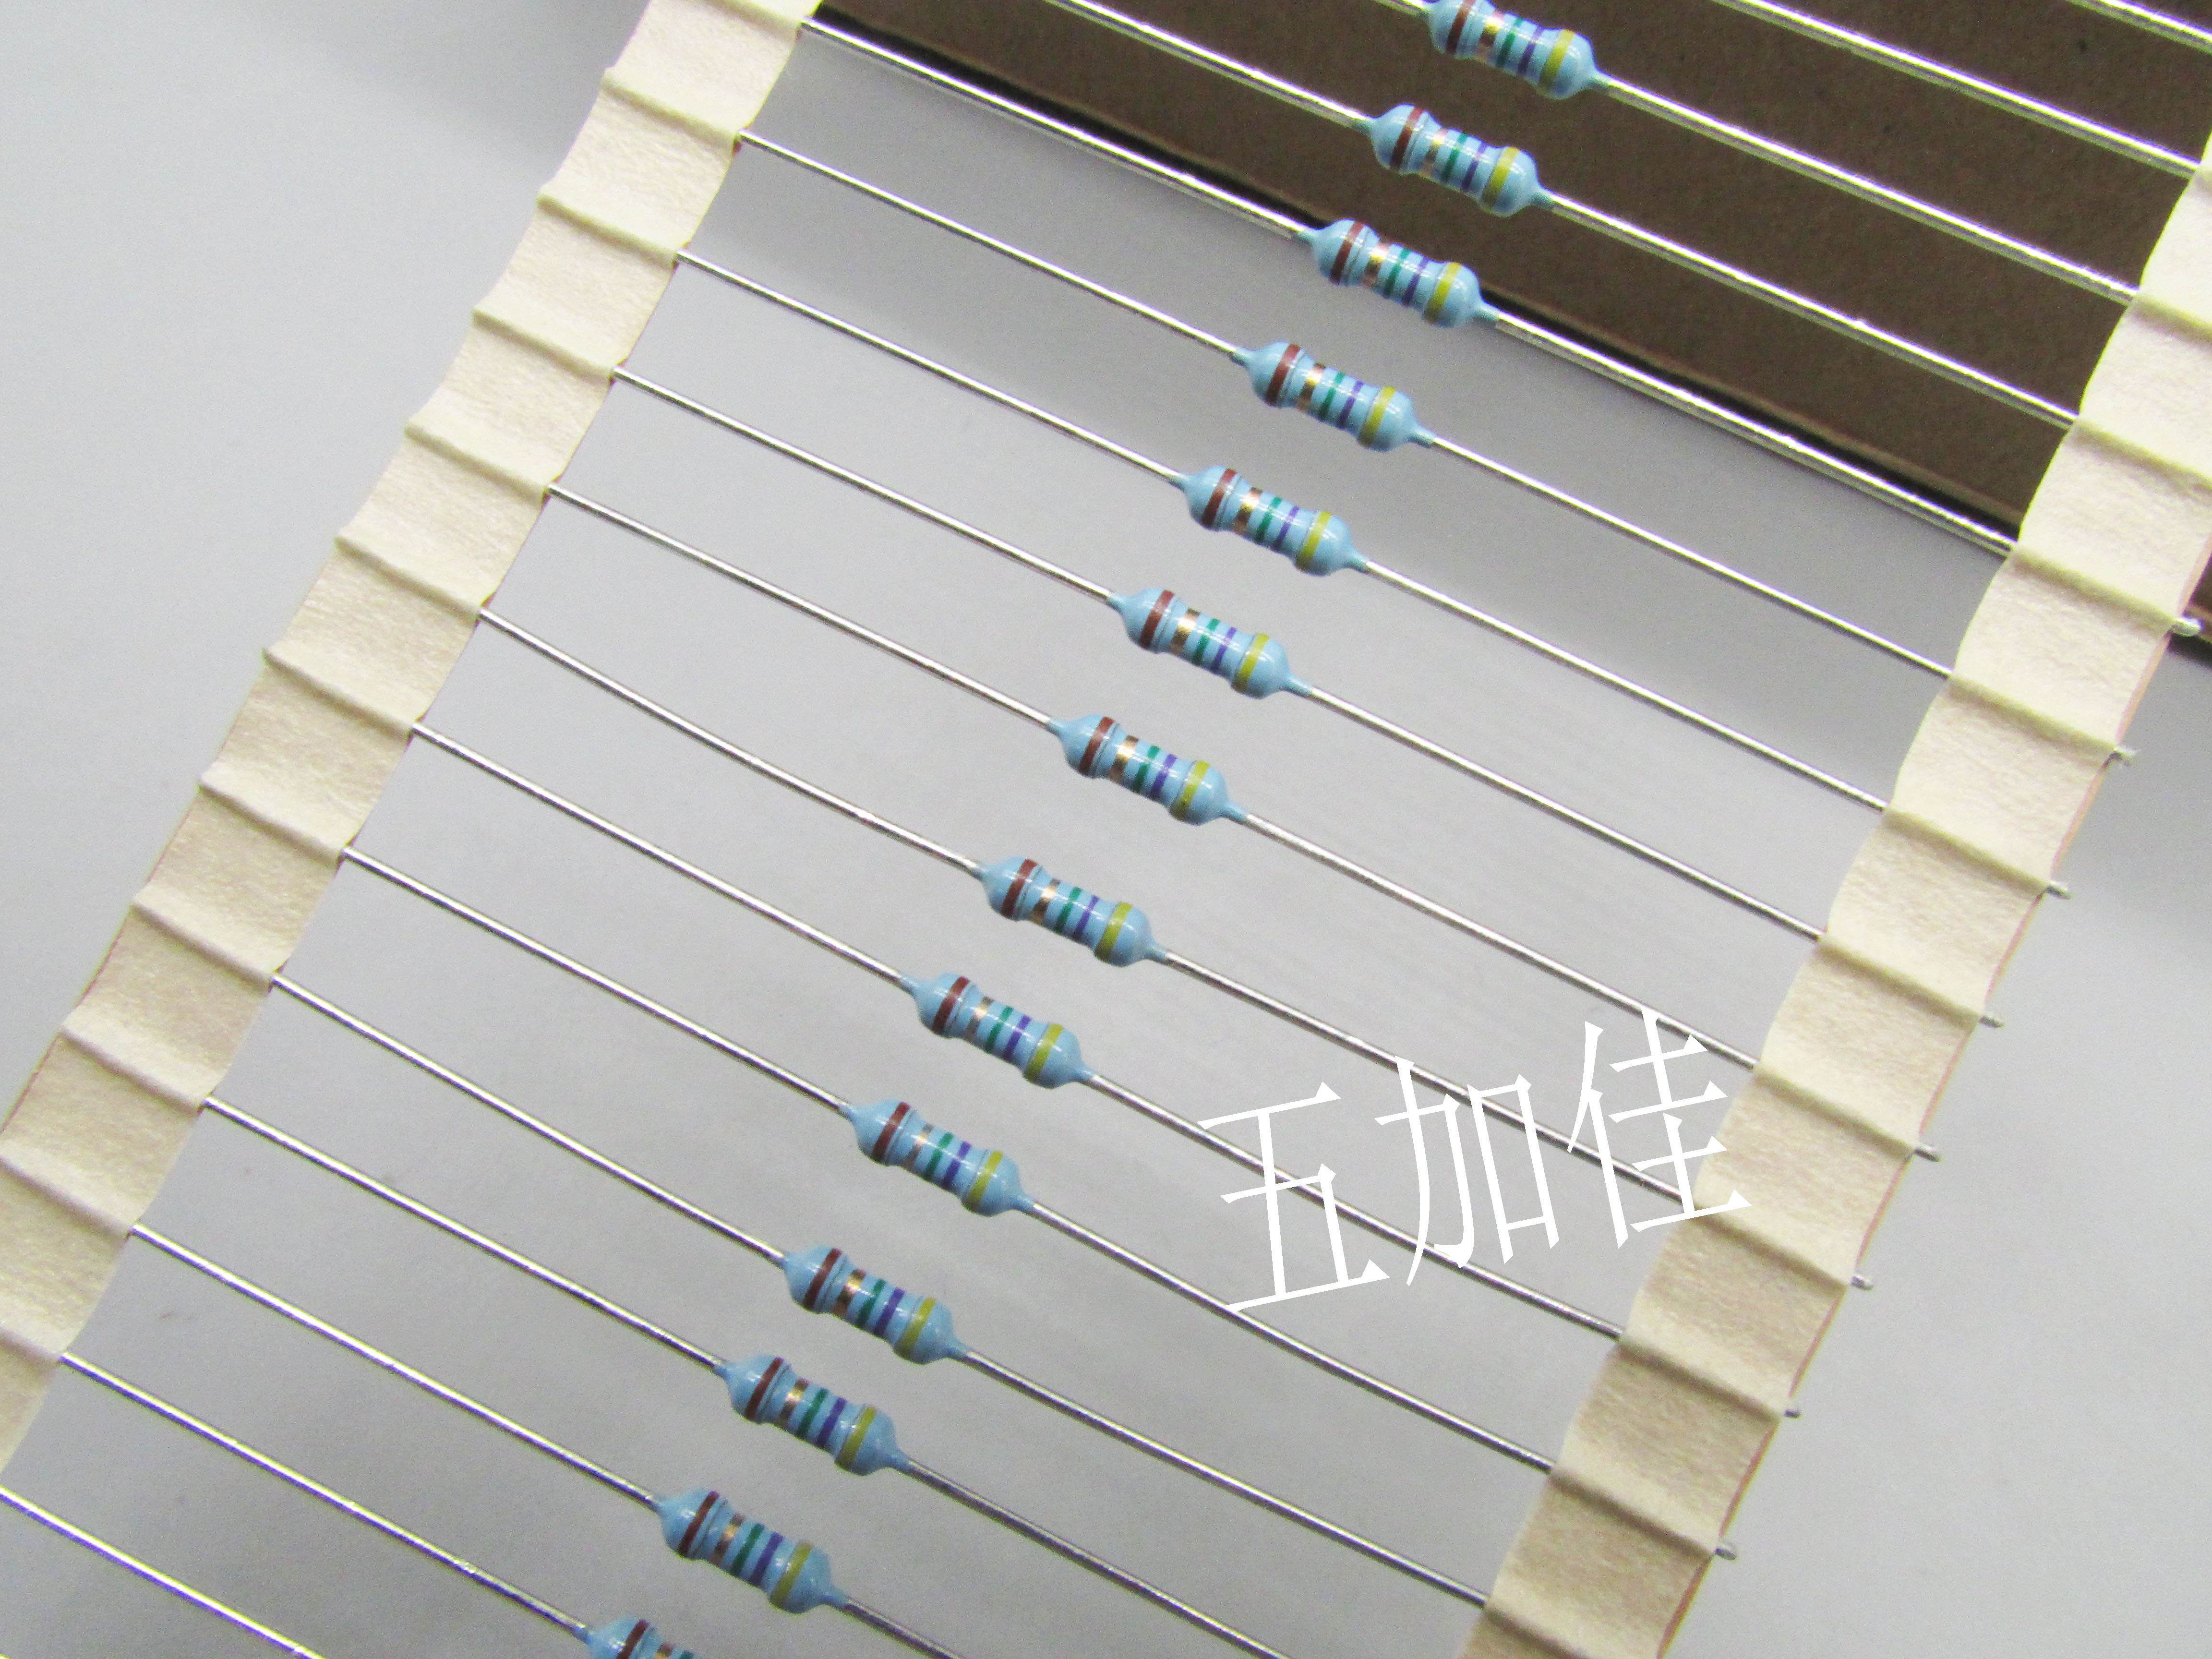 Original neue 100% RNF14FTD47R5 0,25 W RNF1/4W 47,5 R 1% metall film widerstand 2*6MM (Inductor)